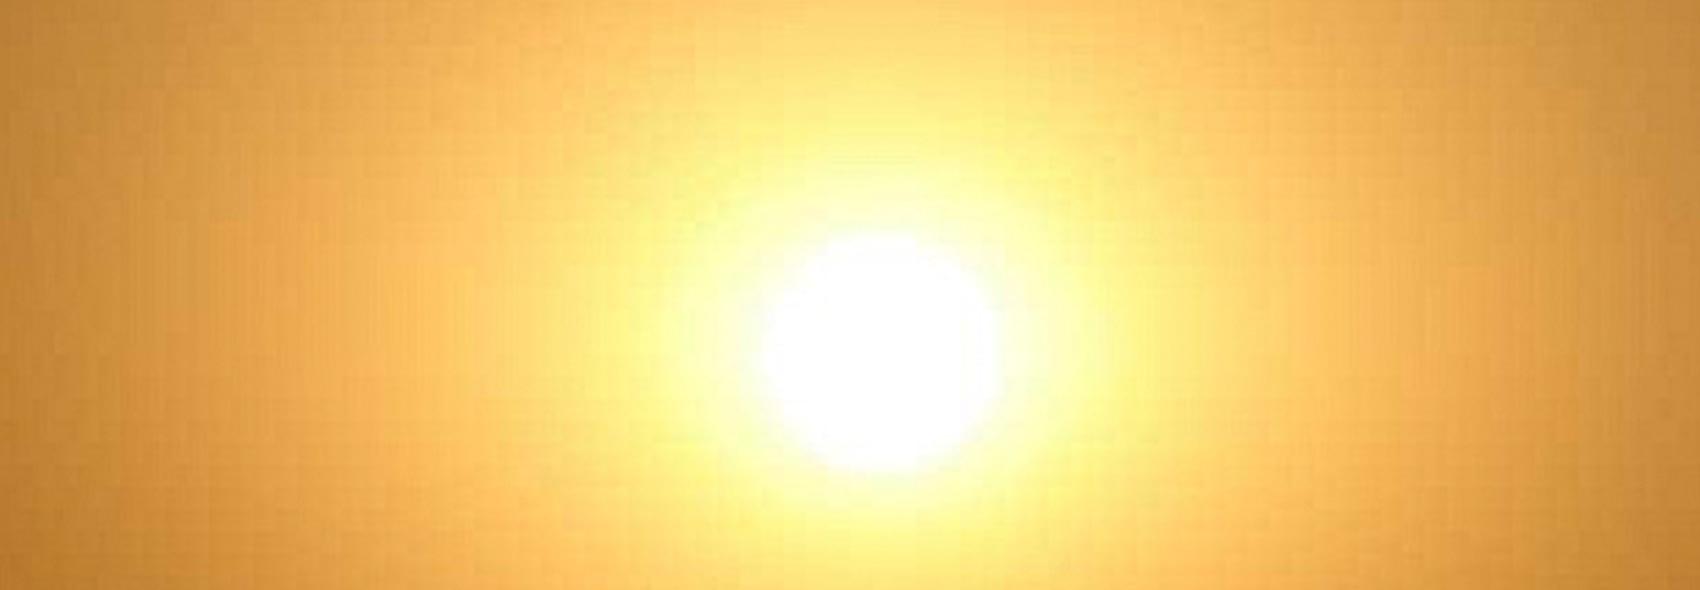 Menopause insomnia sun shine